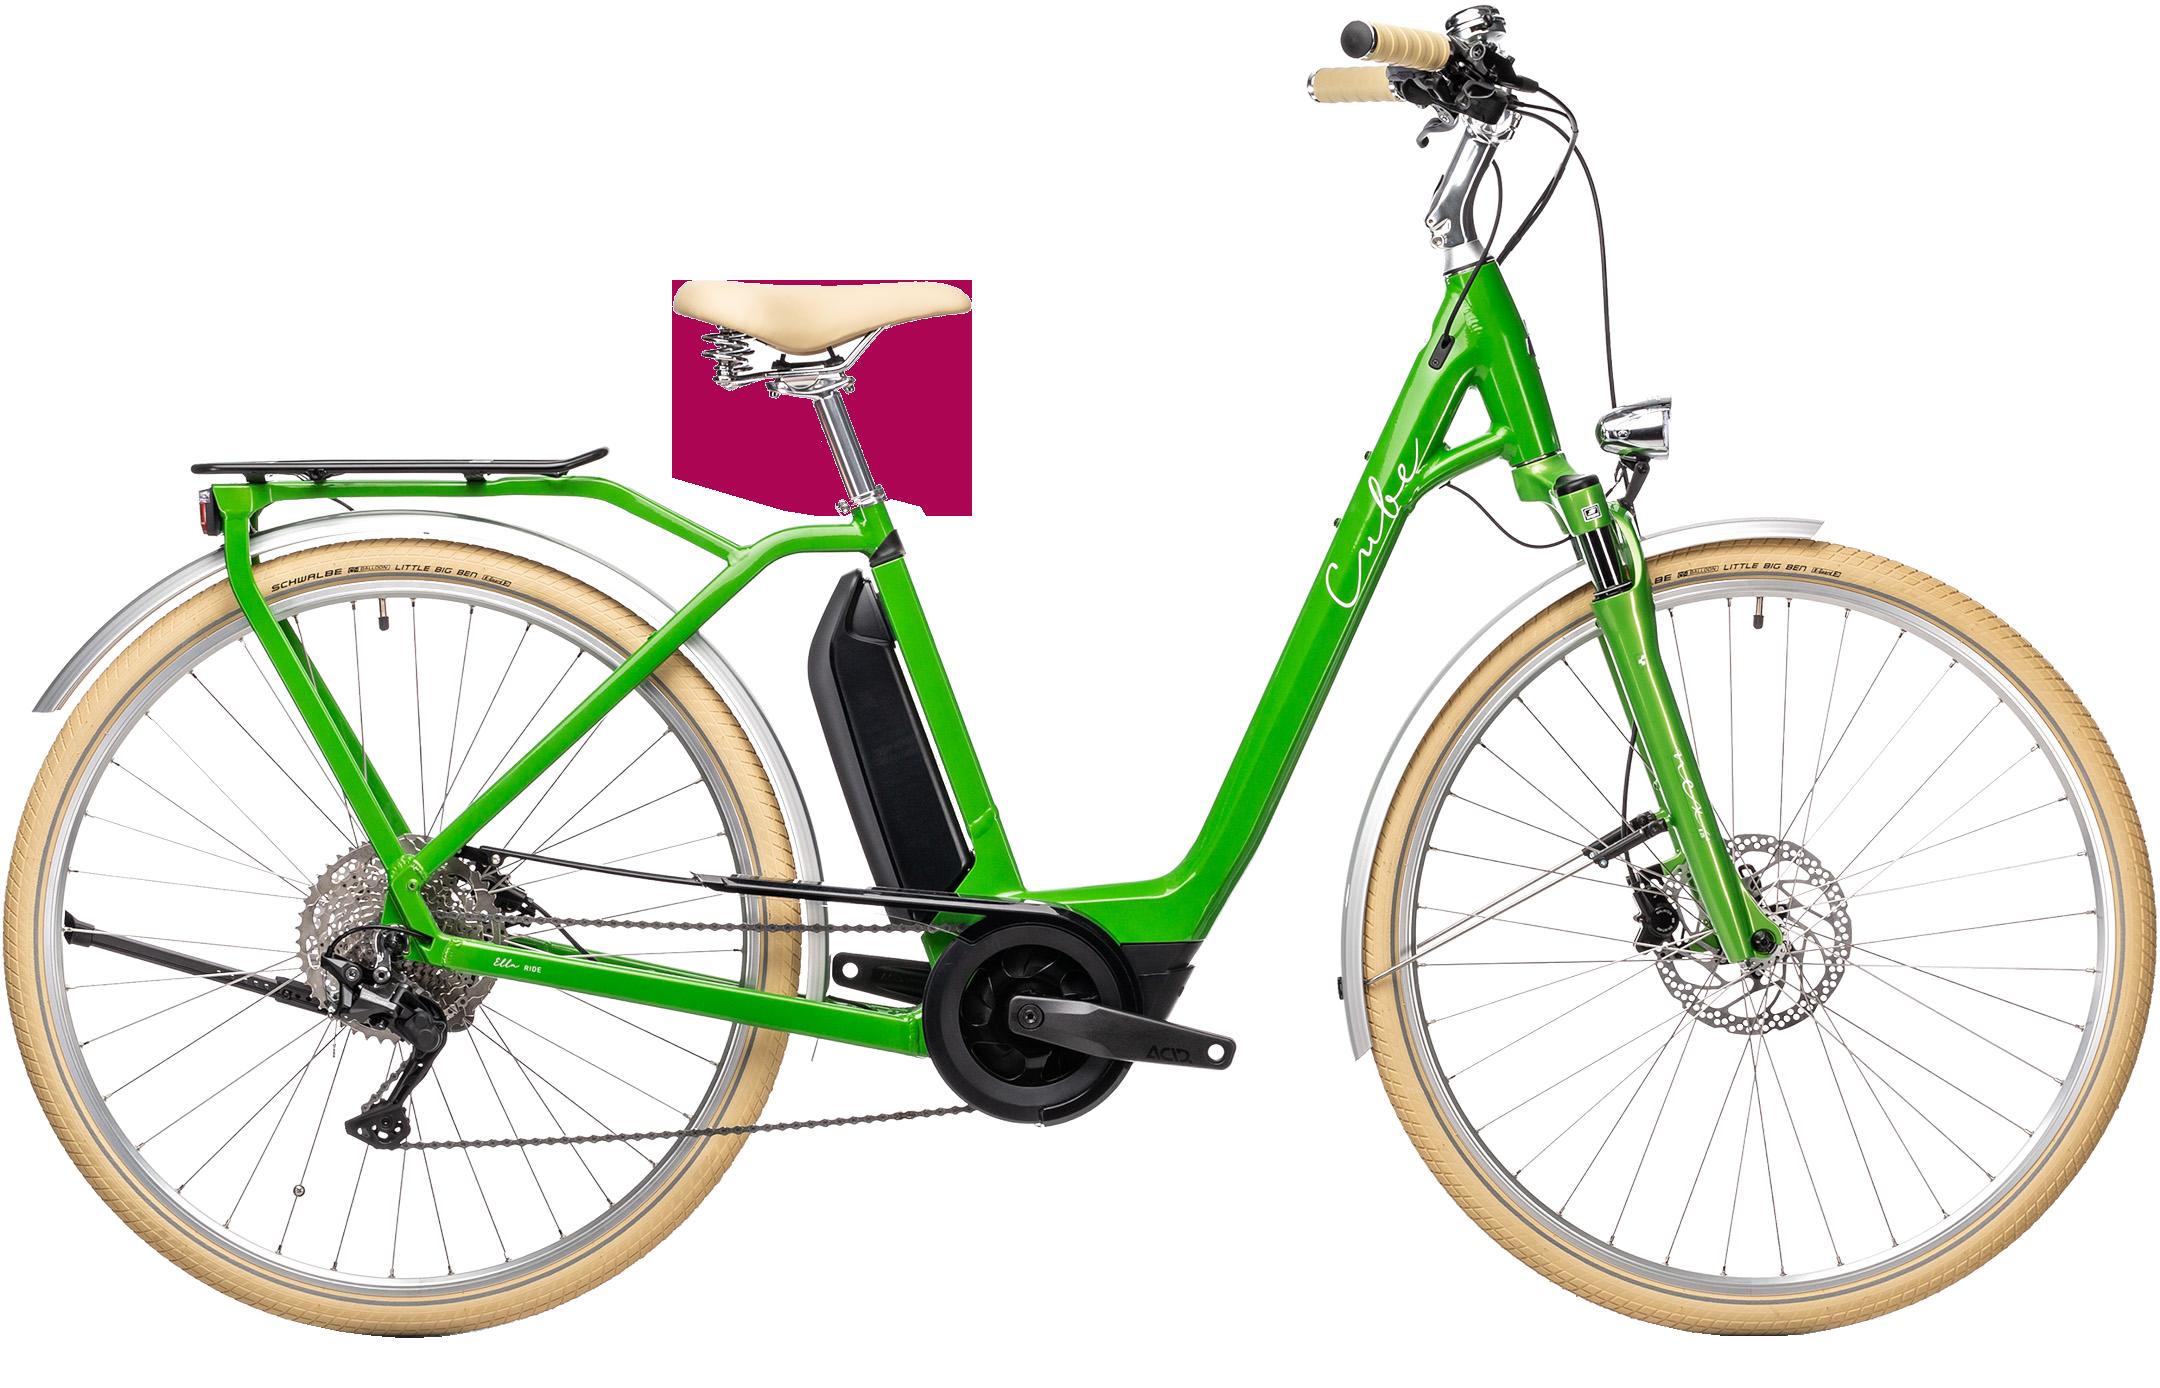 https://w8w5m3f8.stackpathcdn.com/20300/velo-electrique-urbain-ella-ride-hybrid-400-ou-500wh.jpg